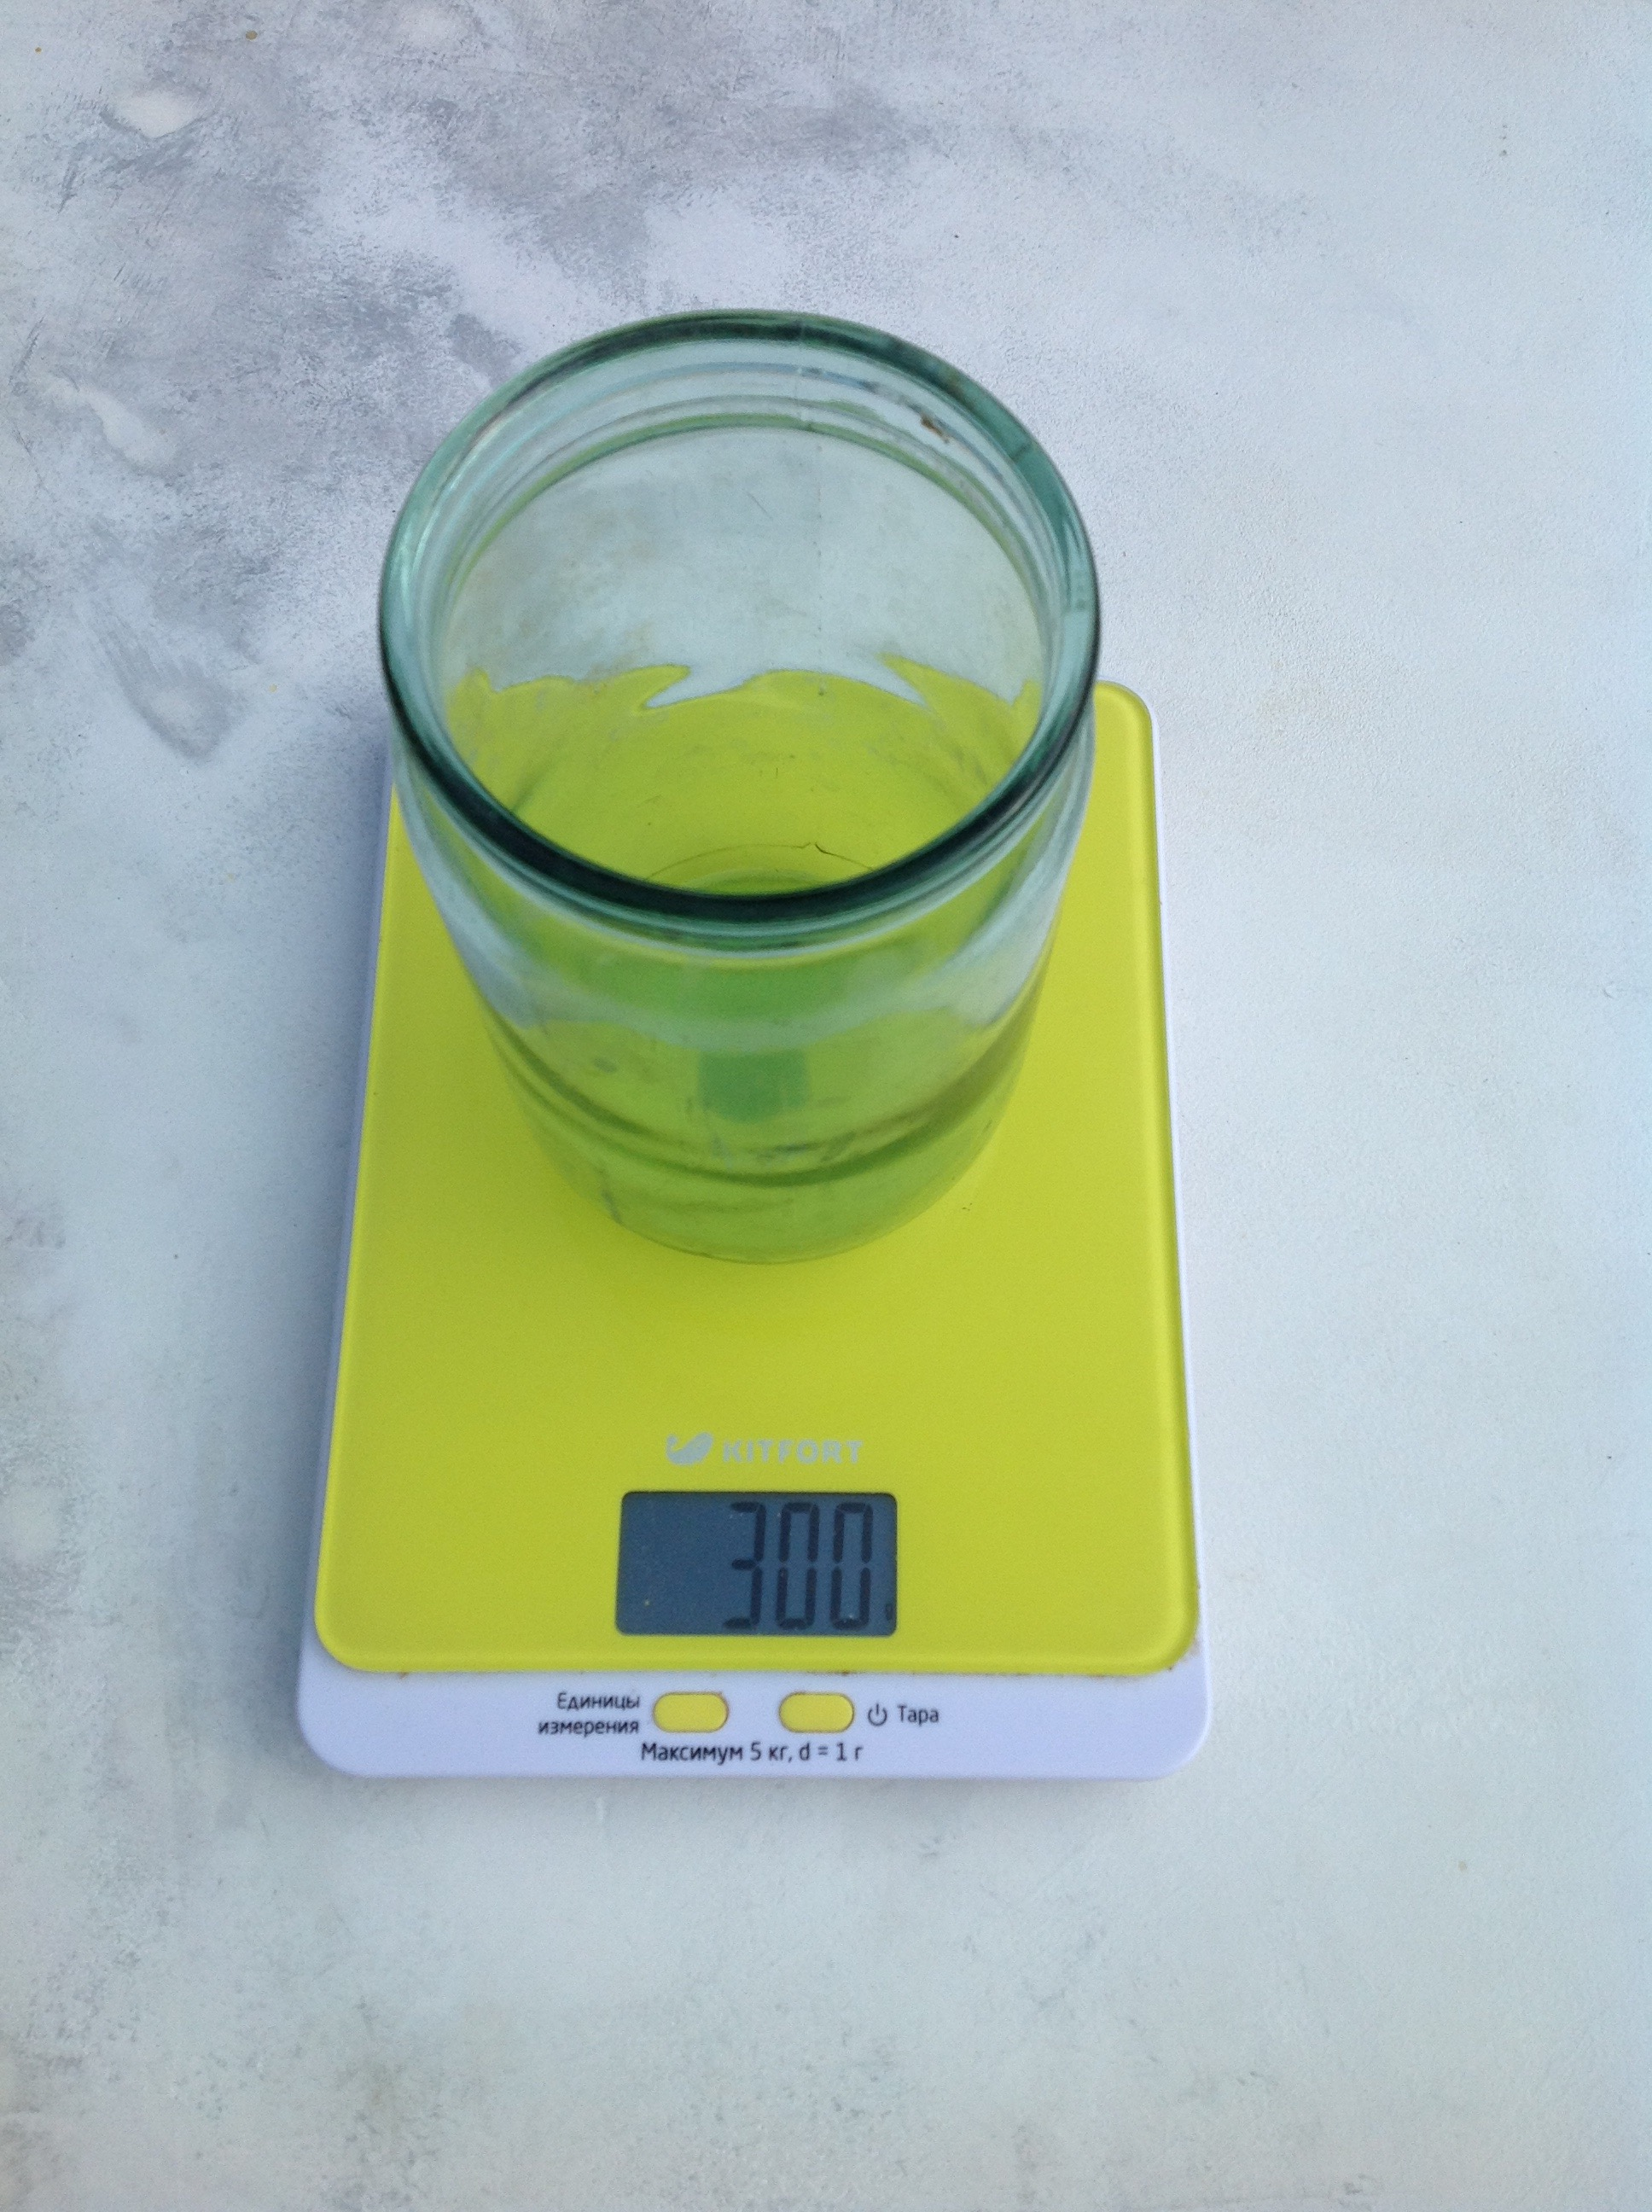 вес банки стеклянной 750 мл